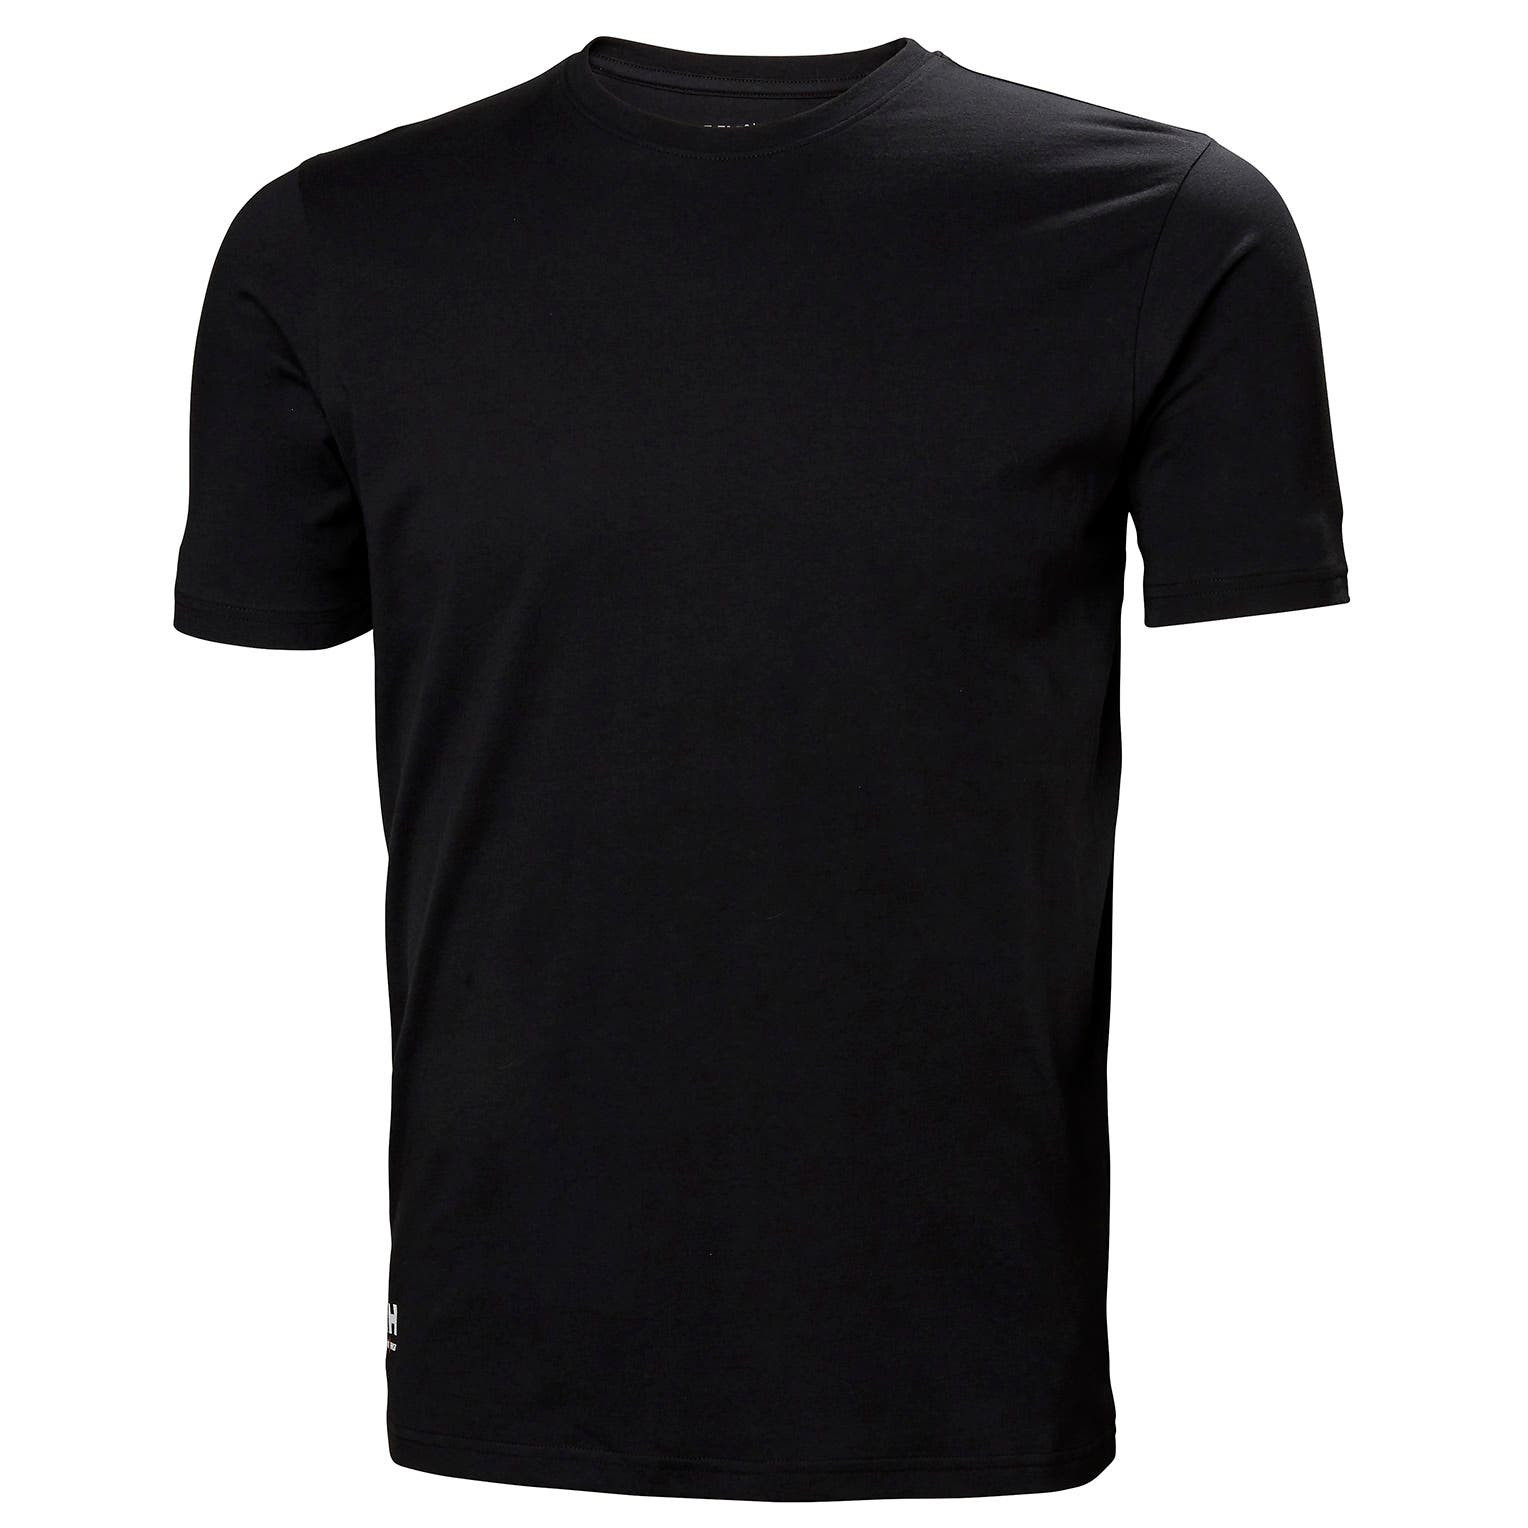 Футболка Helly Hansen Manchester T-Shirt - 79161 (Black; S)